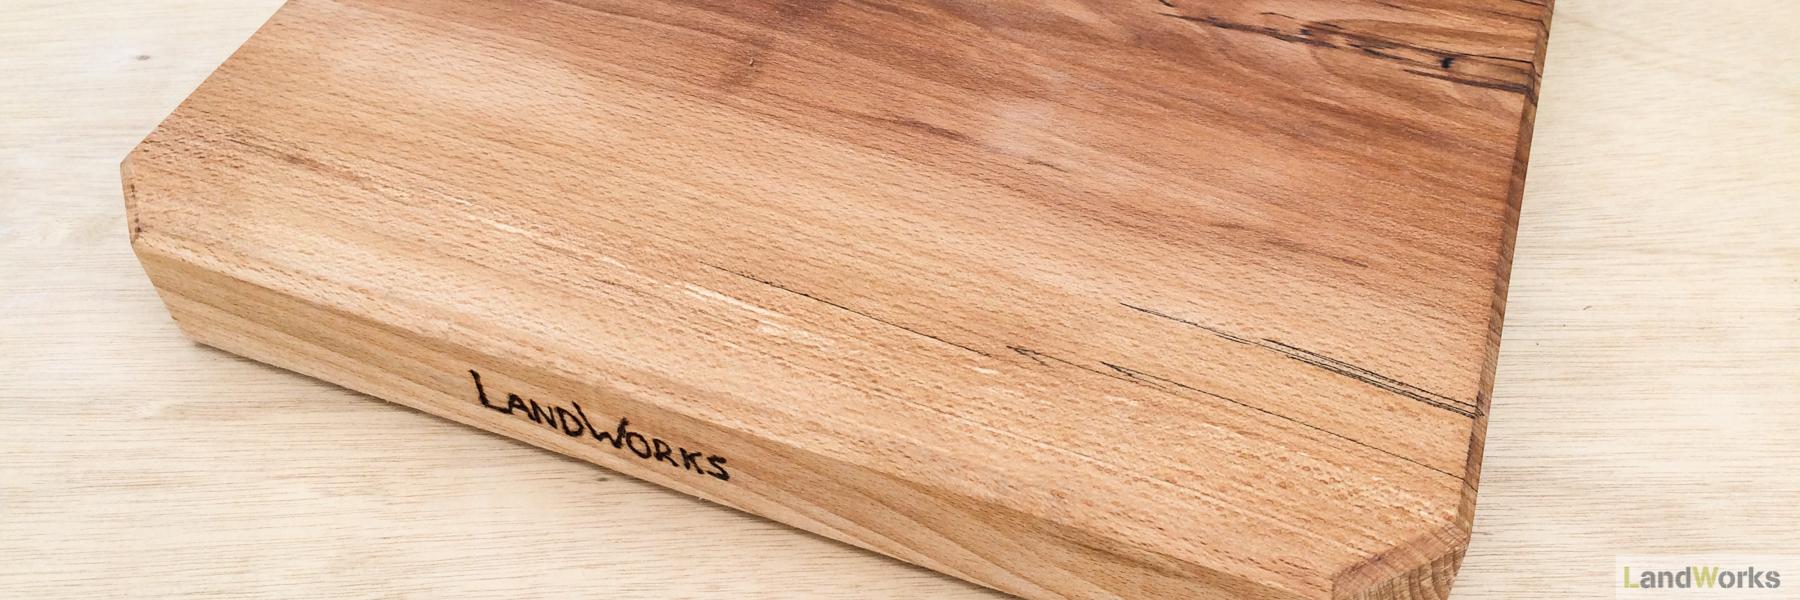 Woodwork handmade at LandWorks